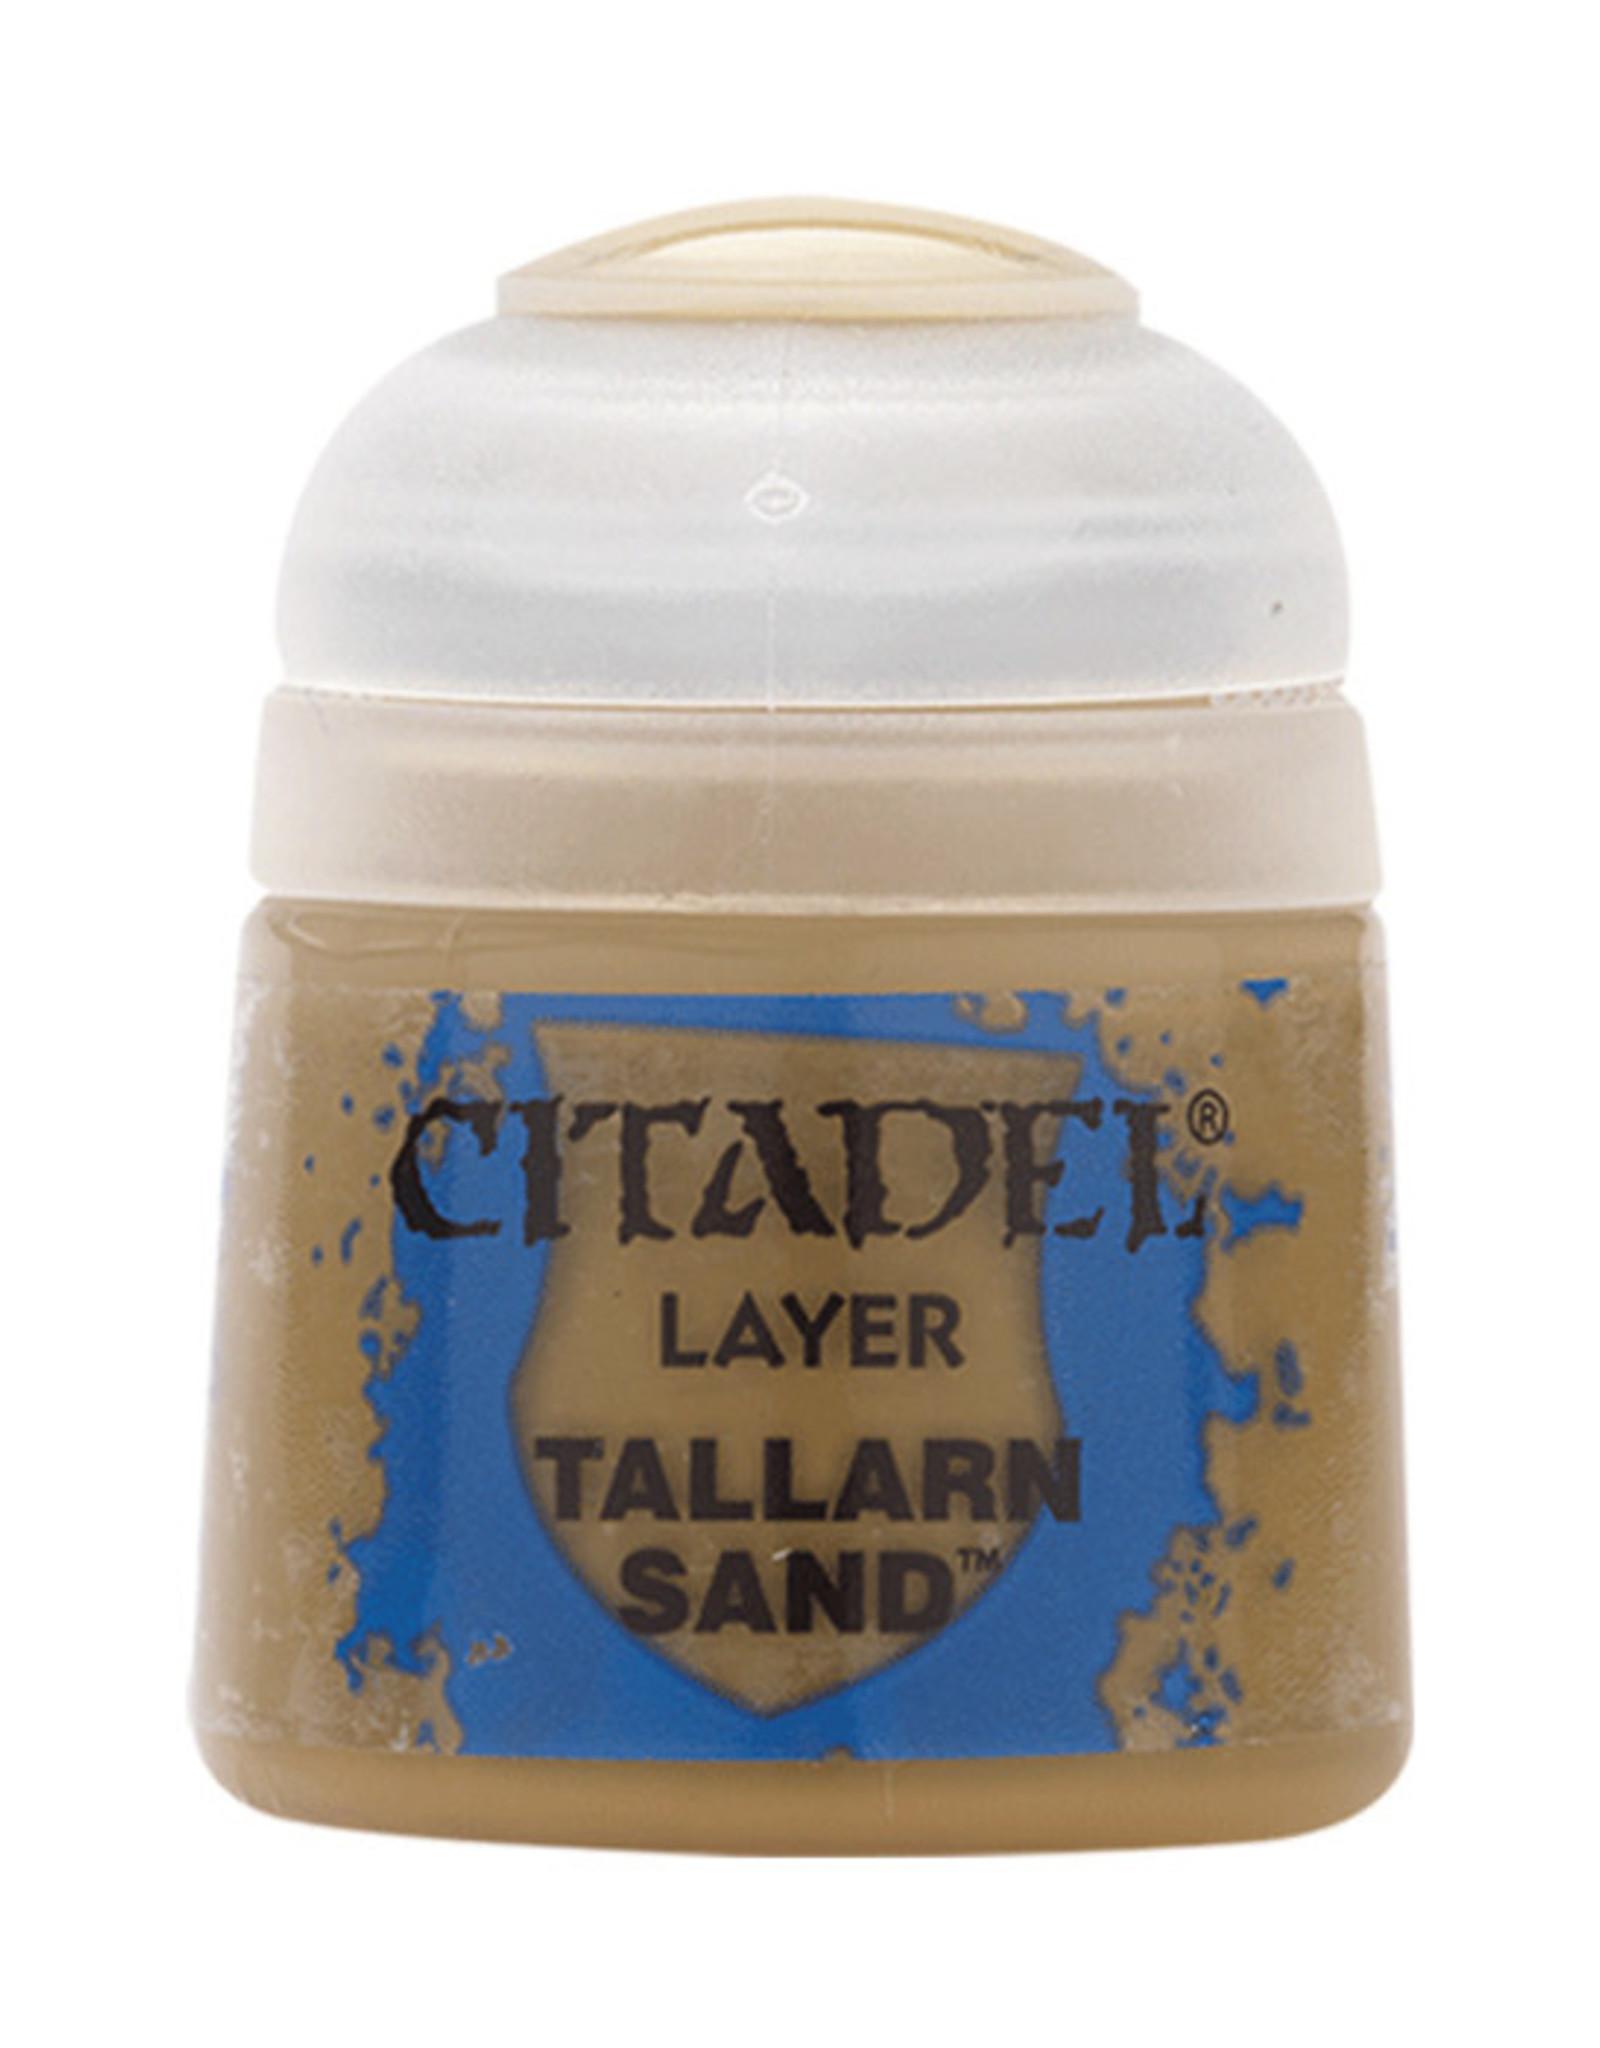 Citadel Citadel Colour: Layer - Tallarn Sand